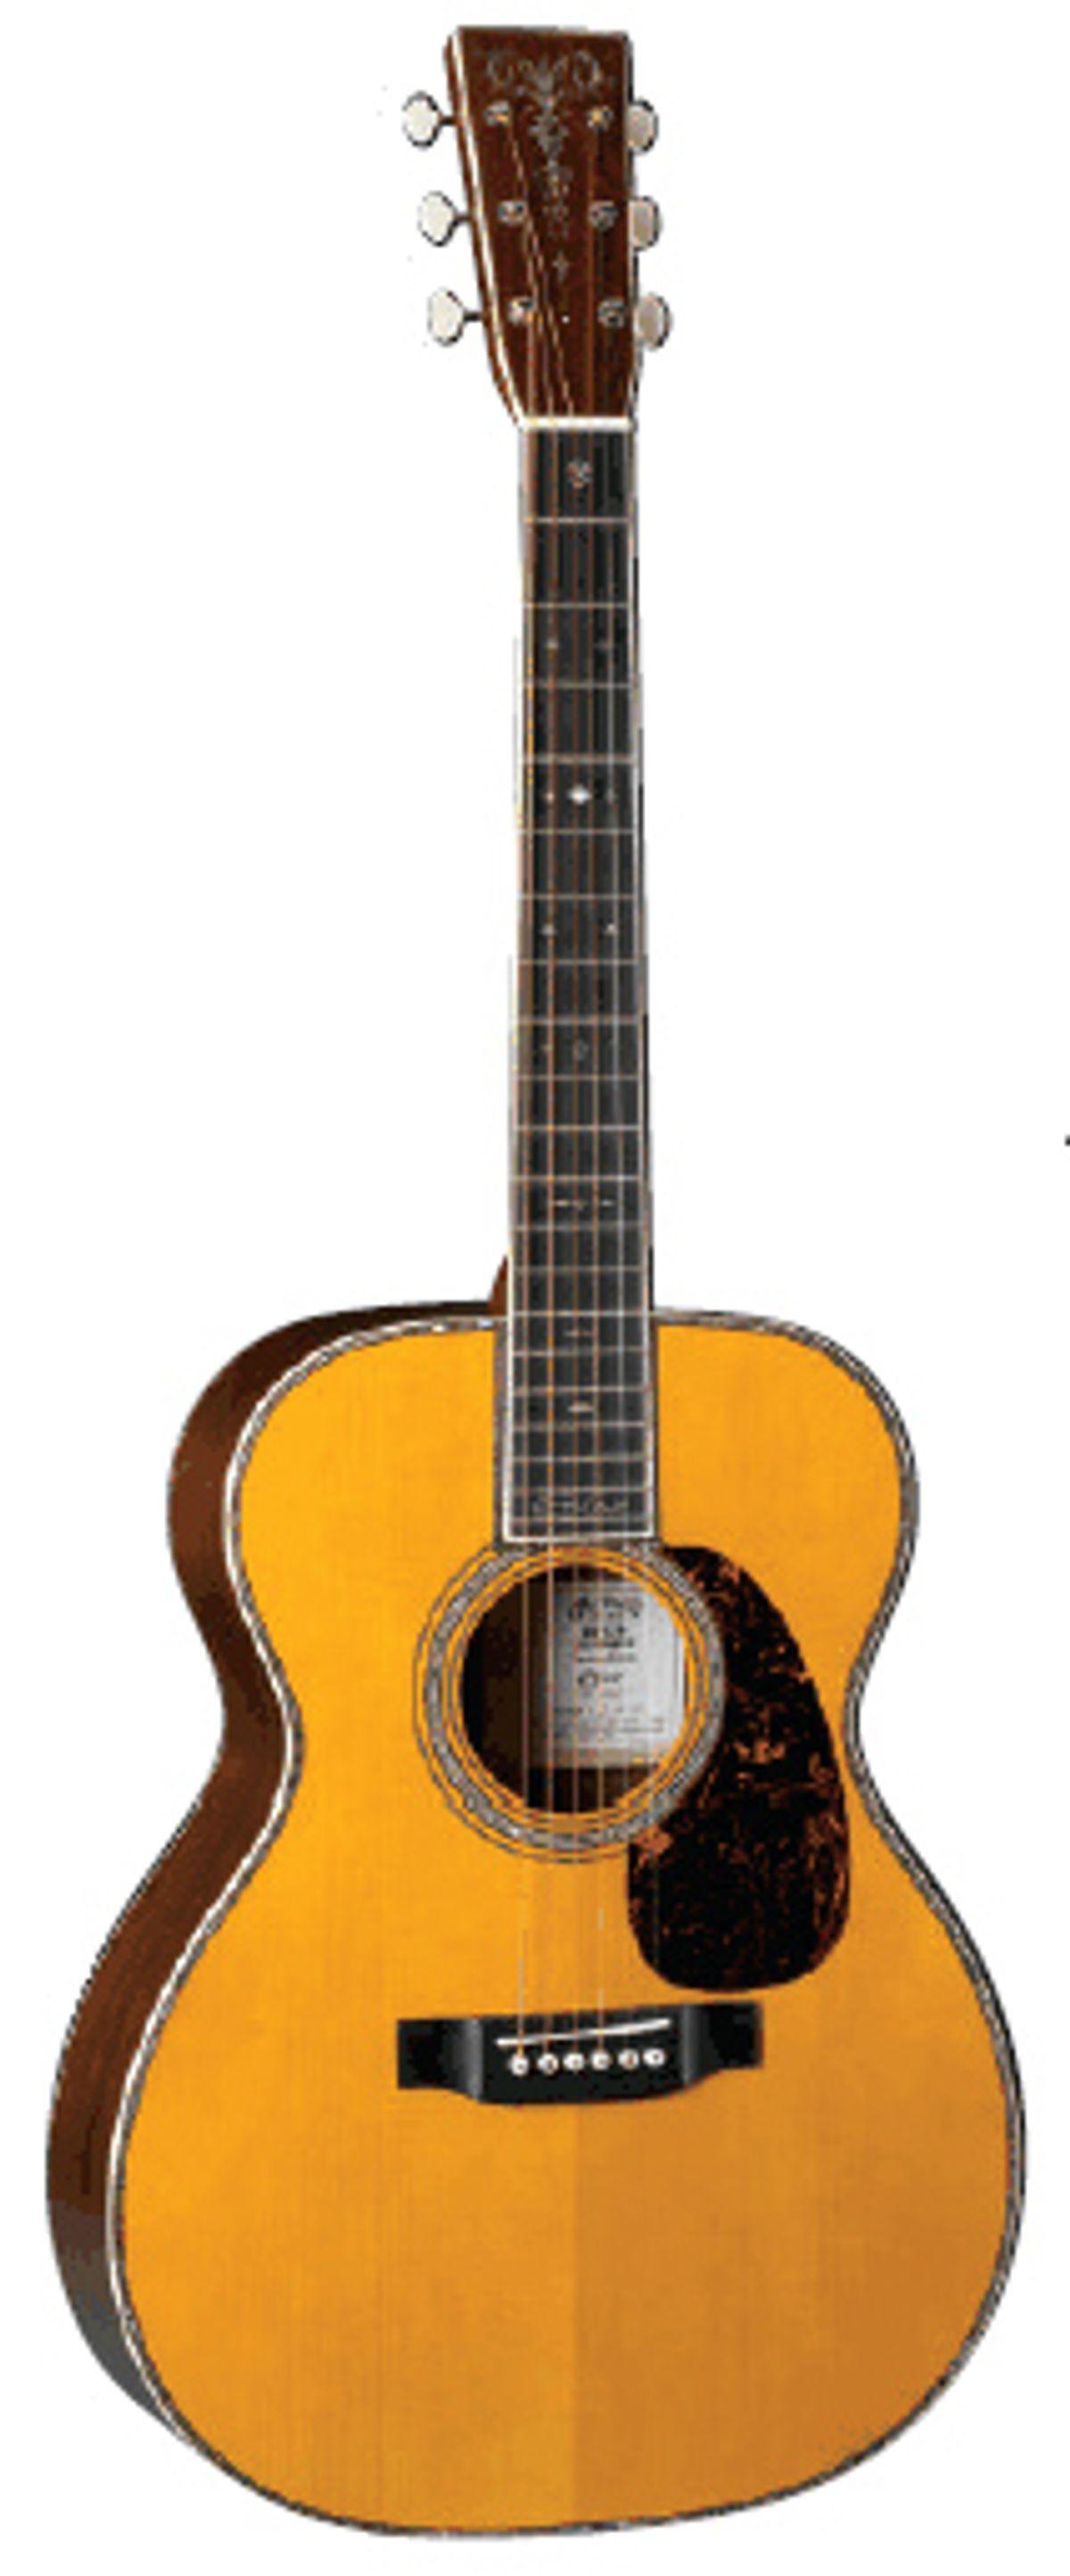 Martin 000-42M Eric Clapton Limited Edition